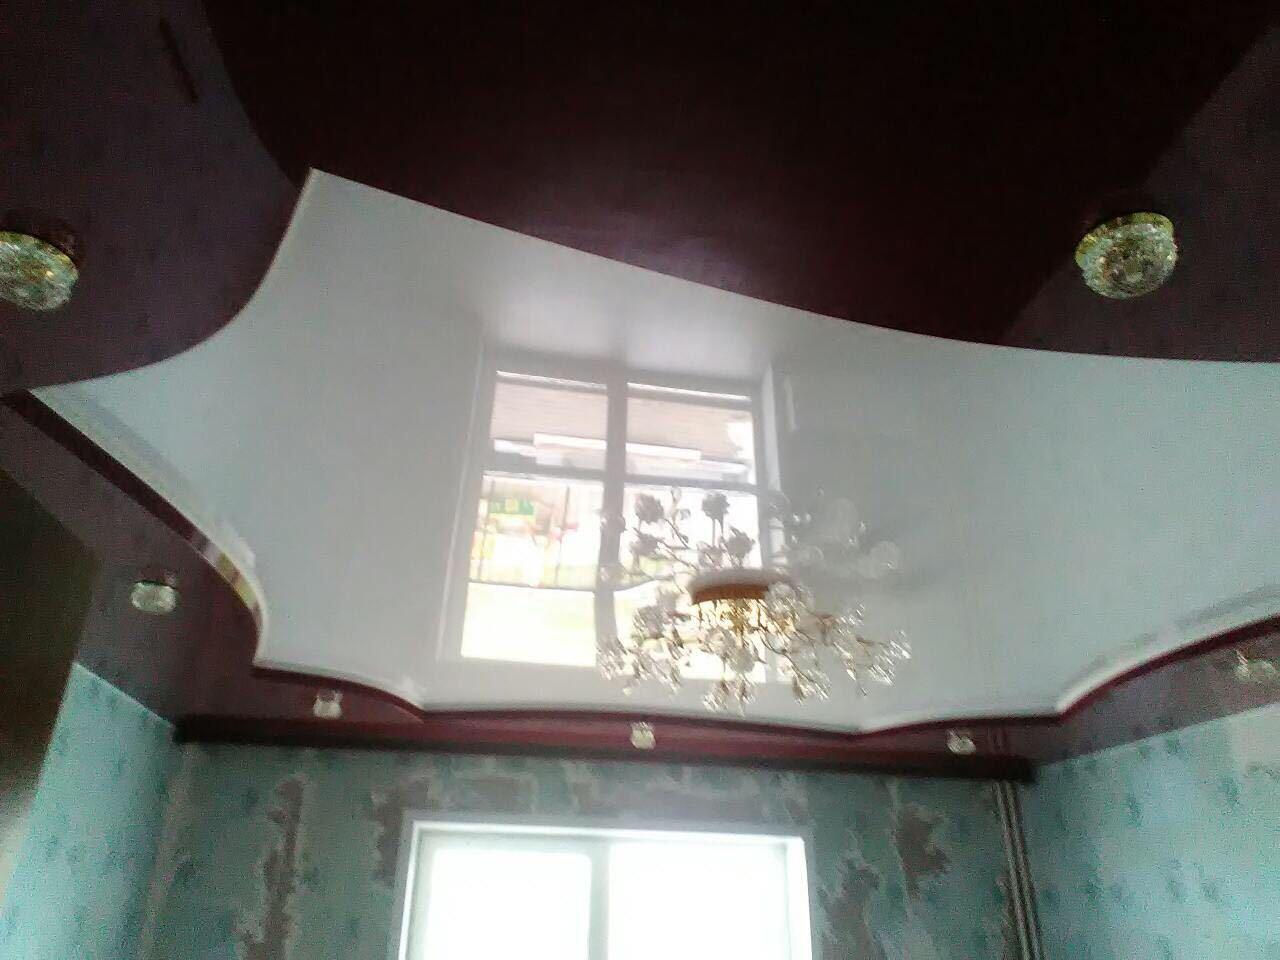 эко-сити ленинск-кузнецкий фото потолков